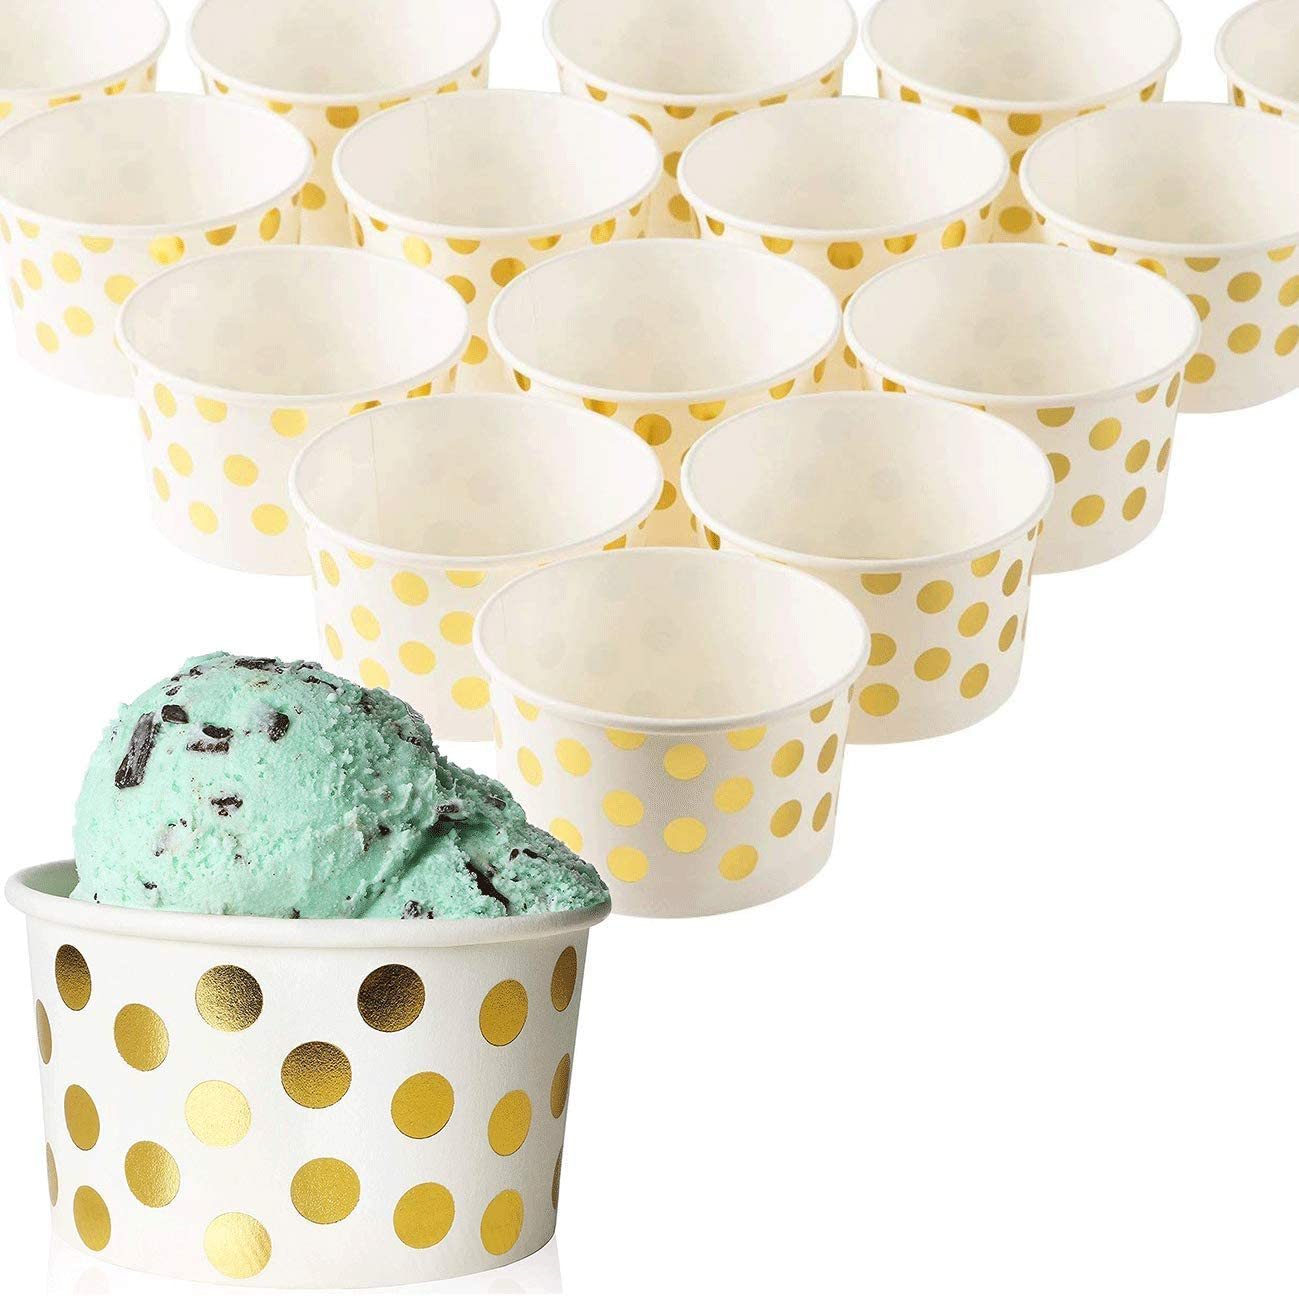 Blue Panda 50-Count Paper Ice Cream Sundae Cups, Yogurt Dessert Bowls, Gold Polka Dot Party Supplies, 8-Ounces